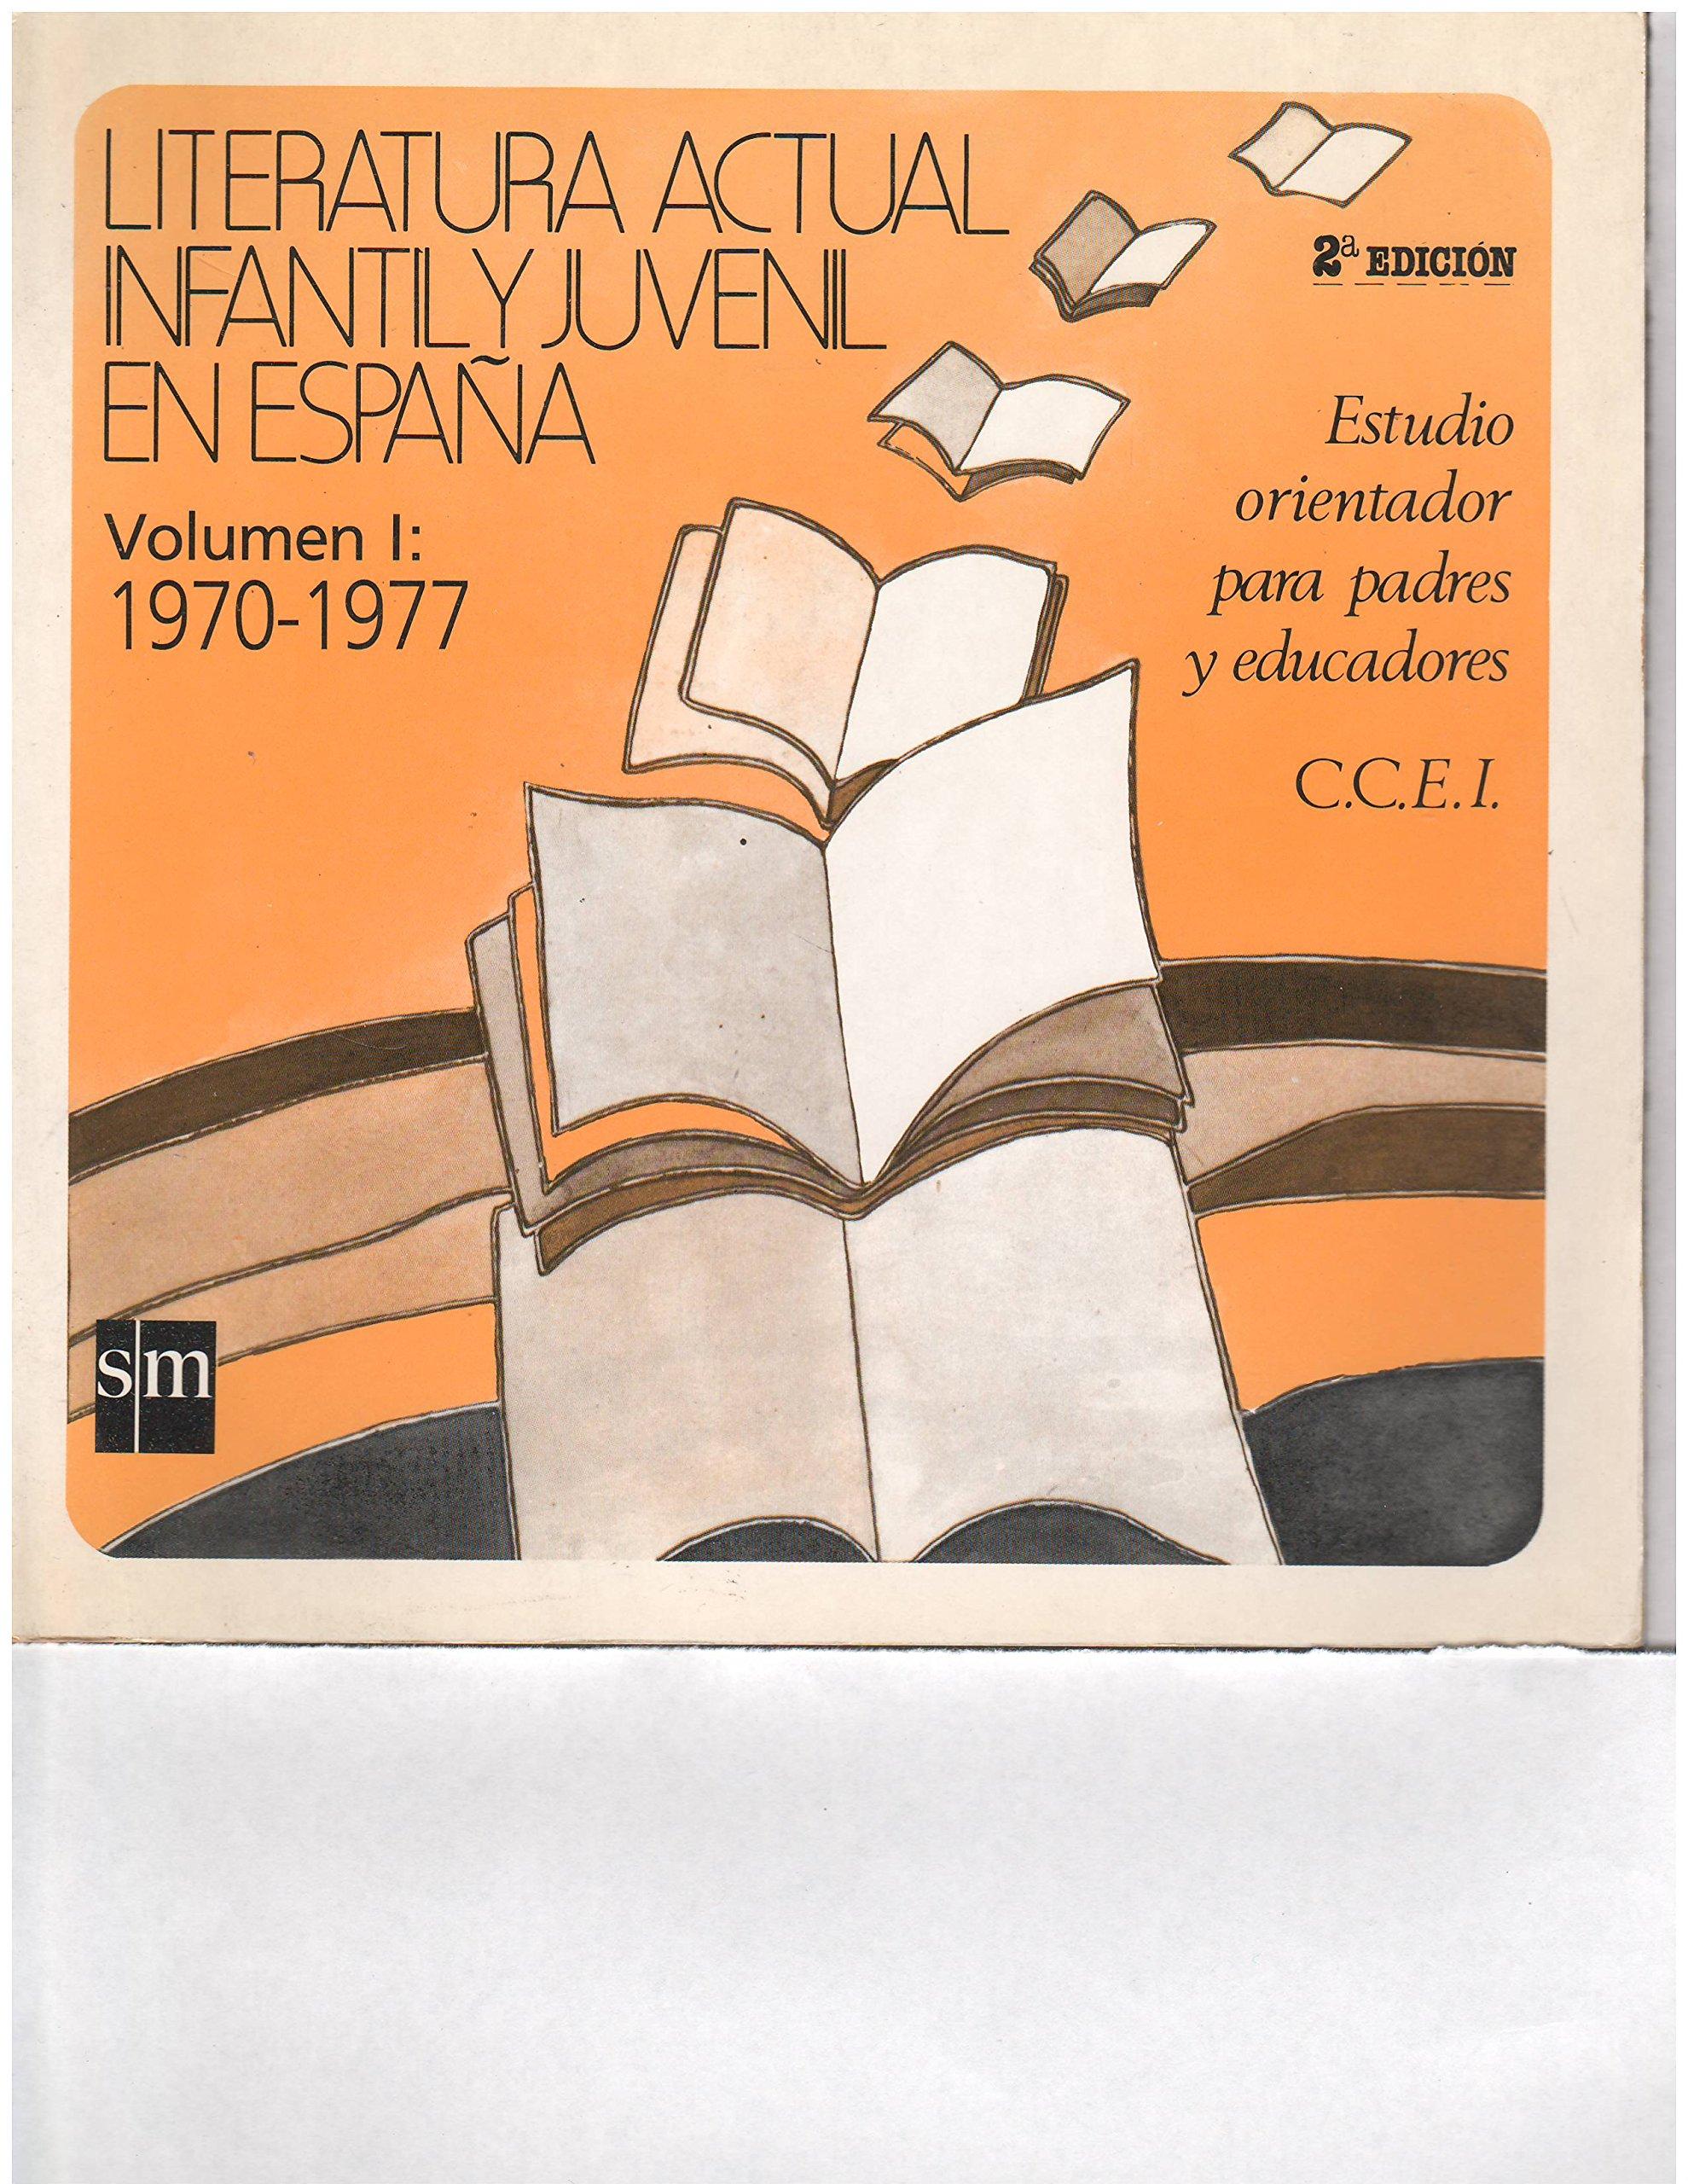 LITERATURA ACTUAL INFANTIL Y JUVENIL EN ESPAÑA (VOL. l 1970-1977) (Spanish) Paperback – 1979